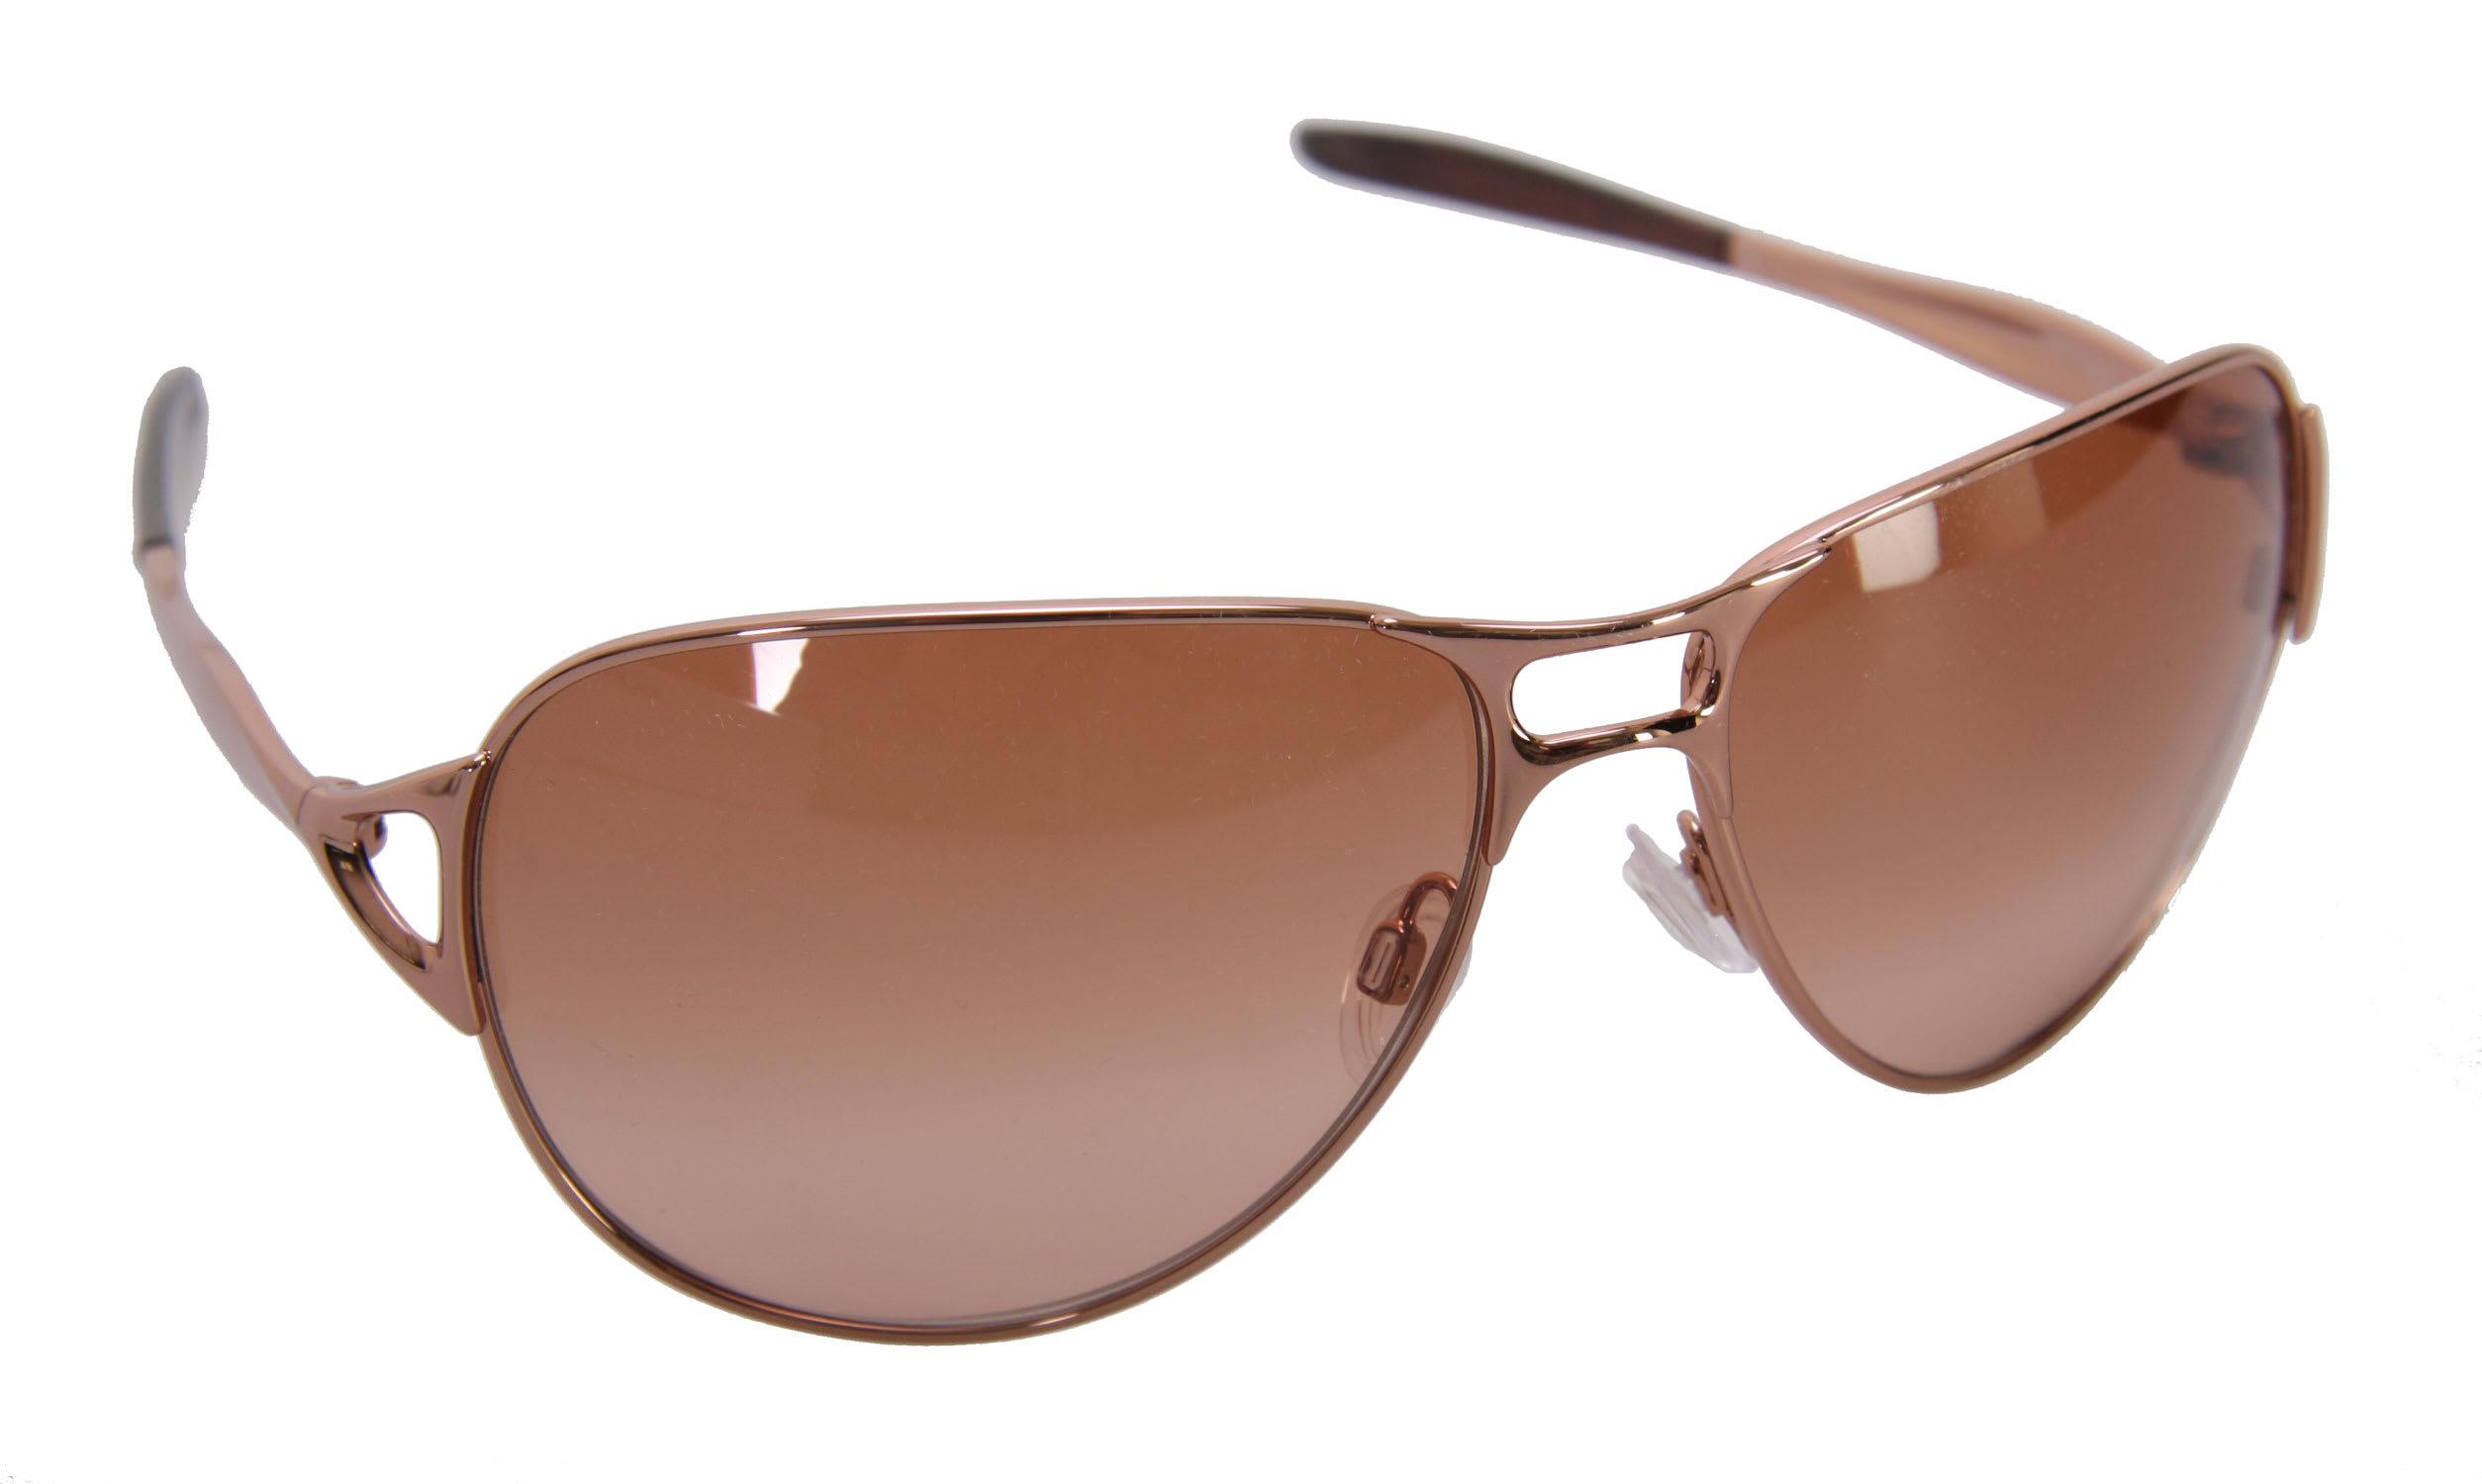 Oakley Hinder Sunglasses - Womens